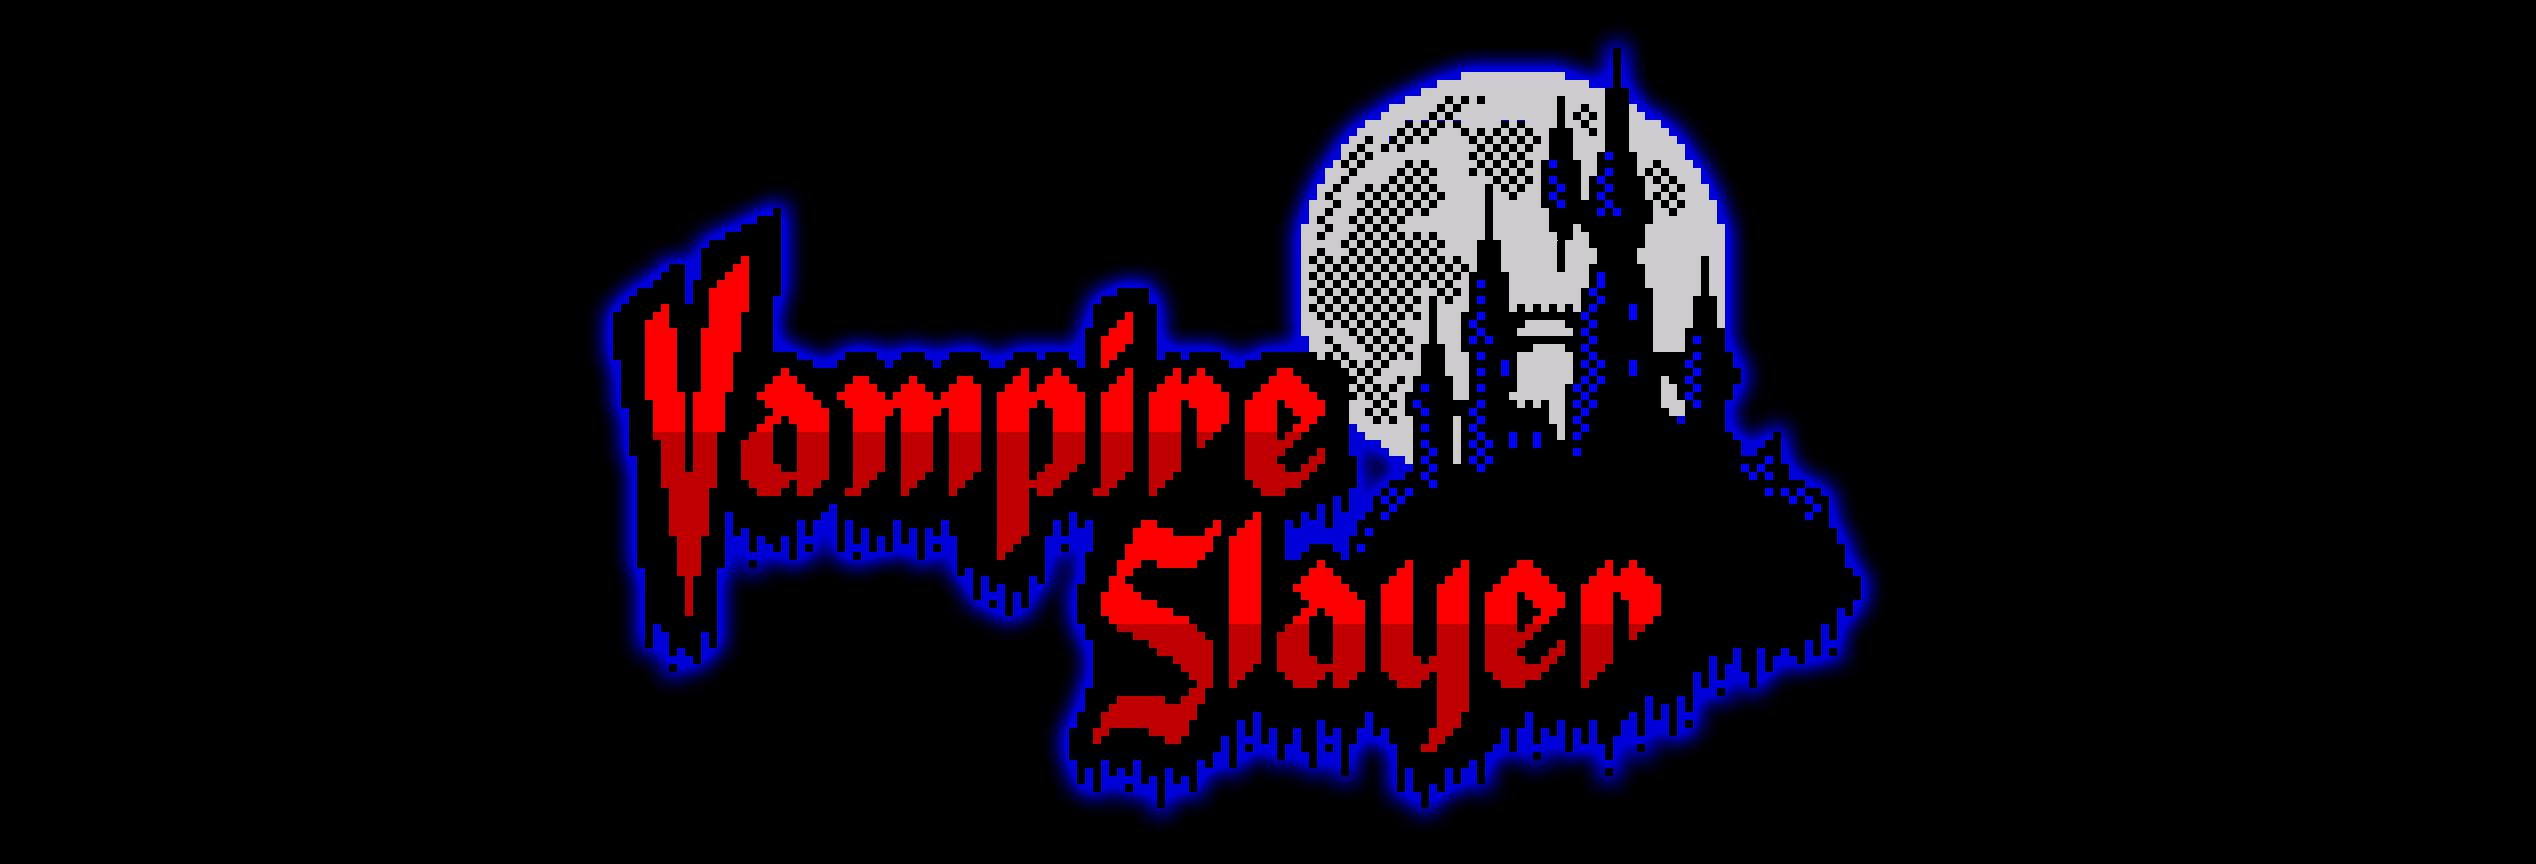 Vampire Slayer (ZX Spectrum 128k - Demo)